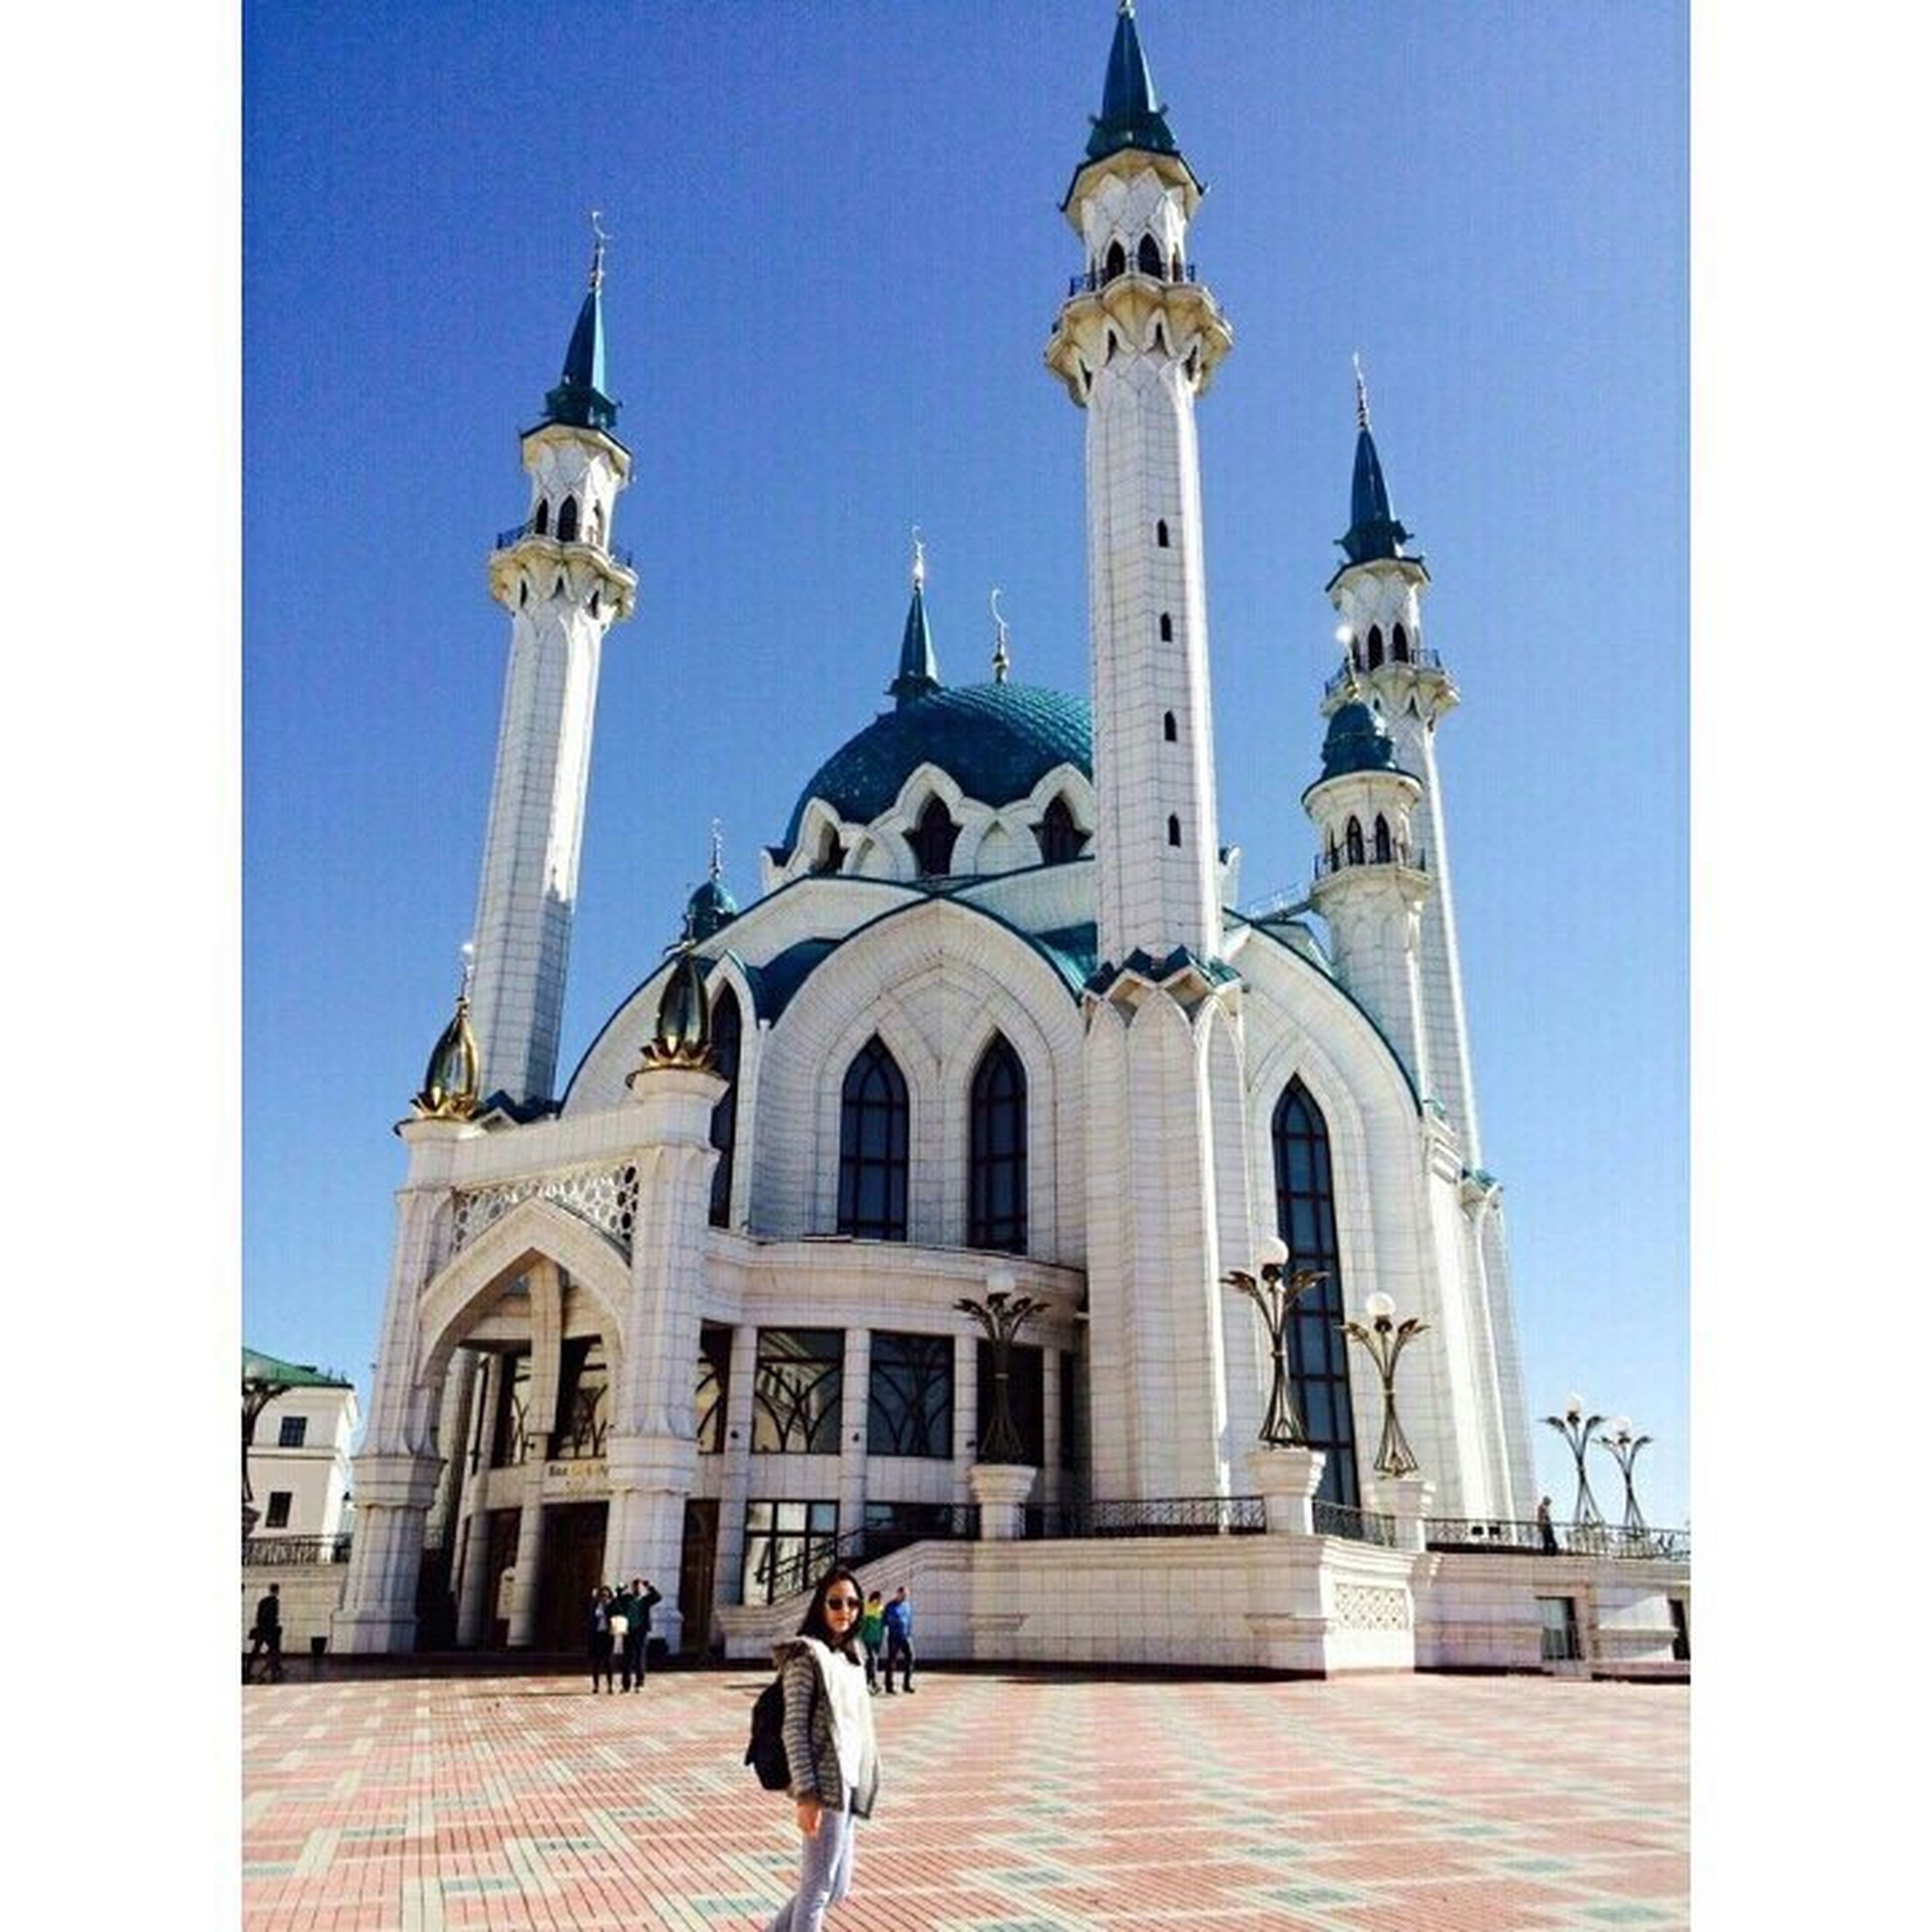 Мечеть Кул Шариф Казань 2015 Весна💐🌷🌿 хочу в казаньгород 🌙🕌